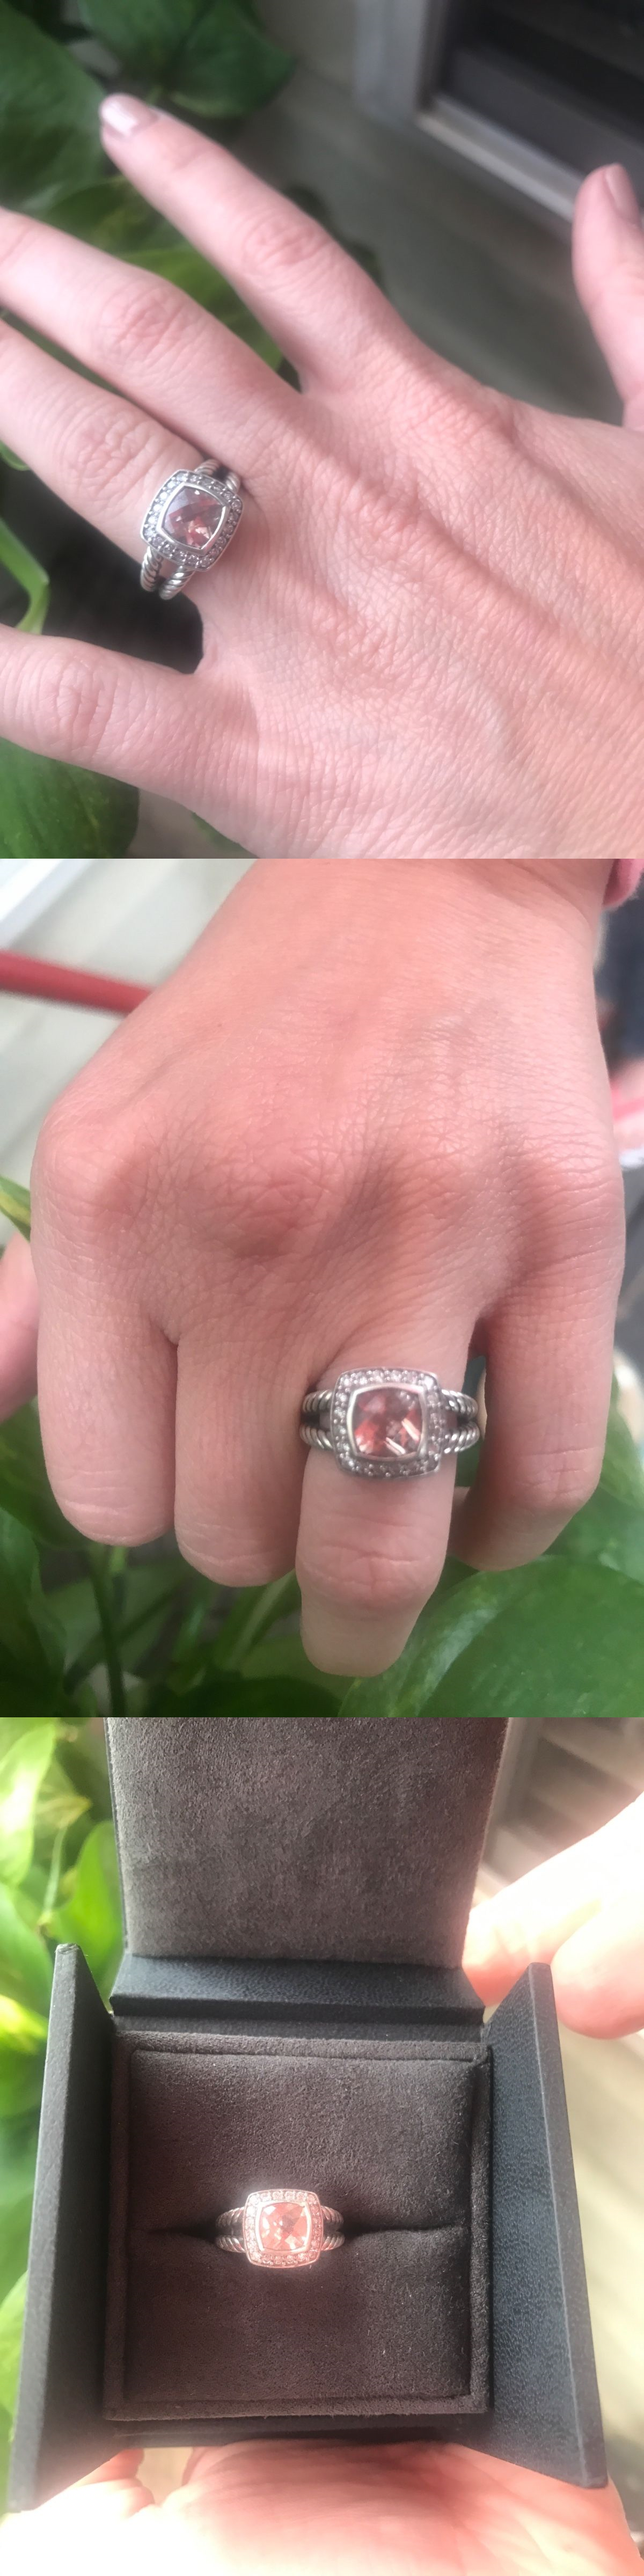 Precious Metal without Stones 164325: David Yurman Ring Size 4 ...